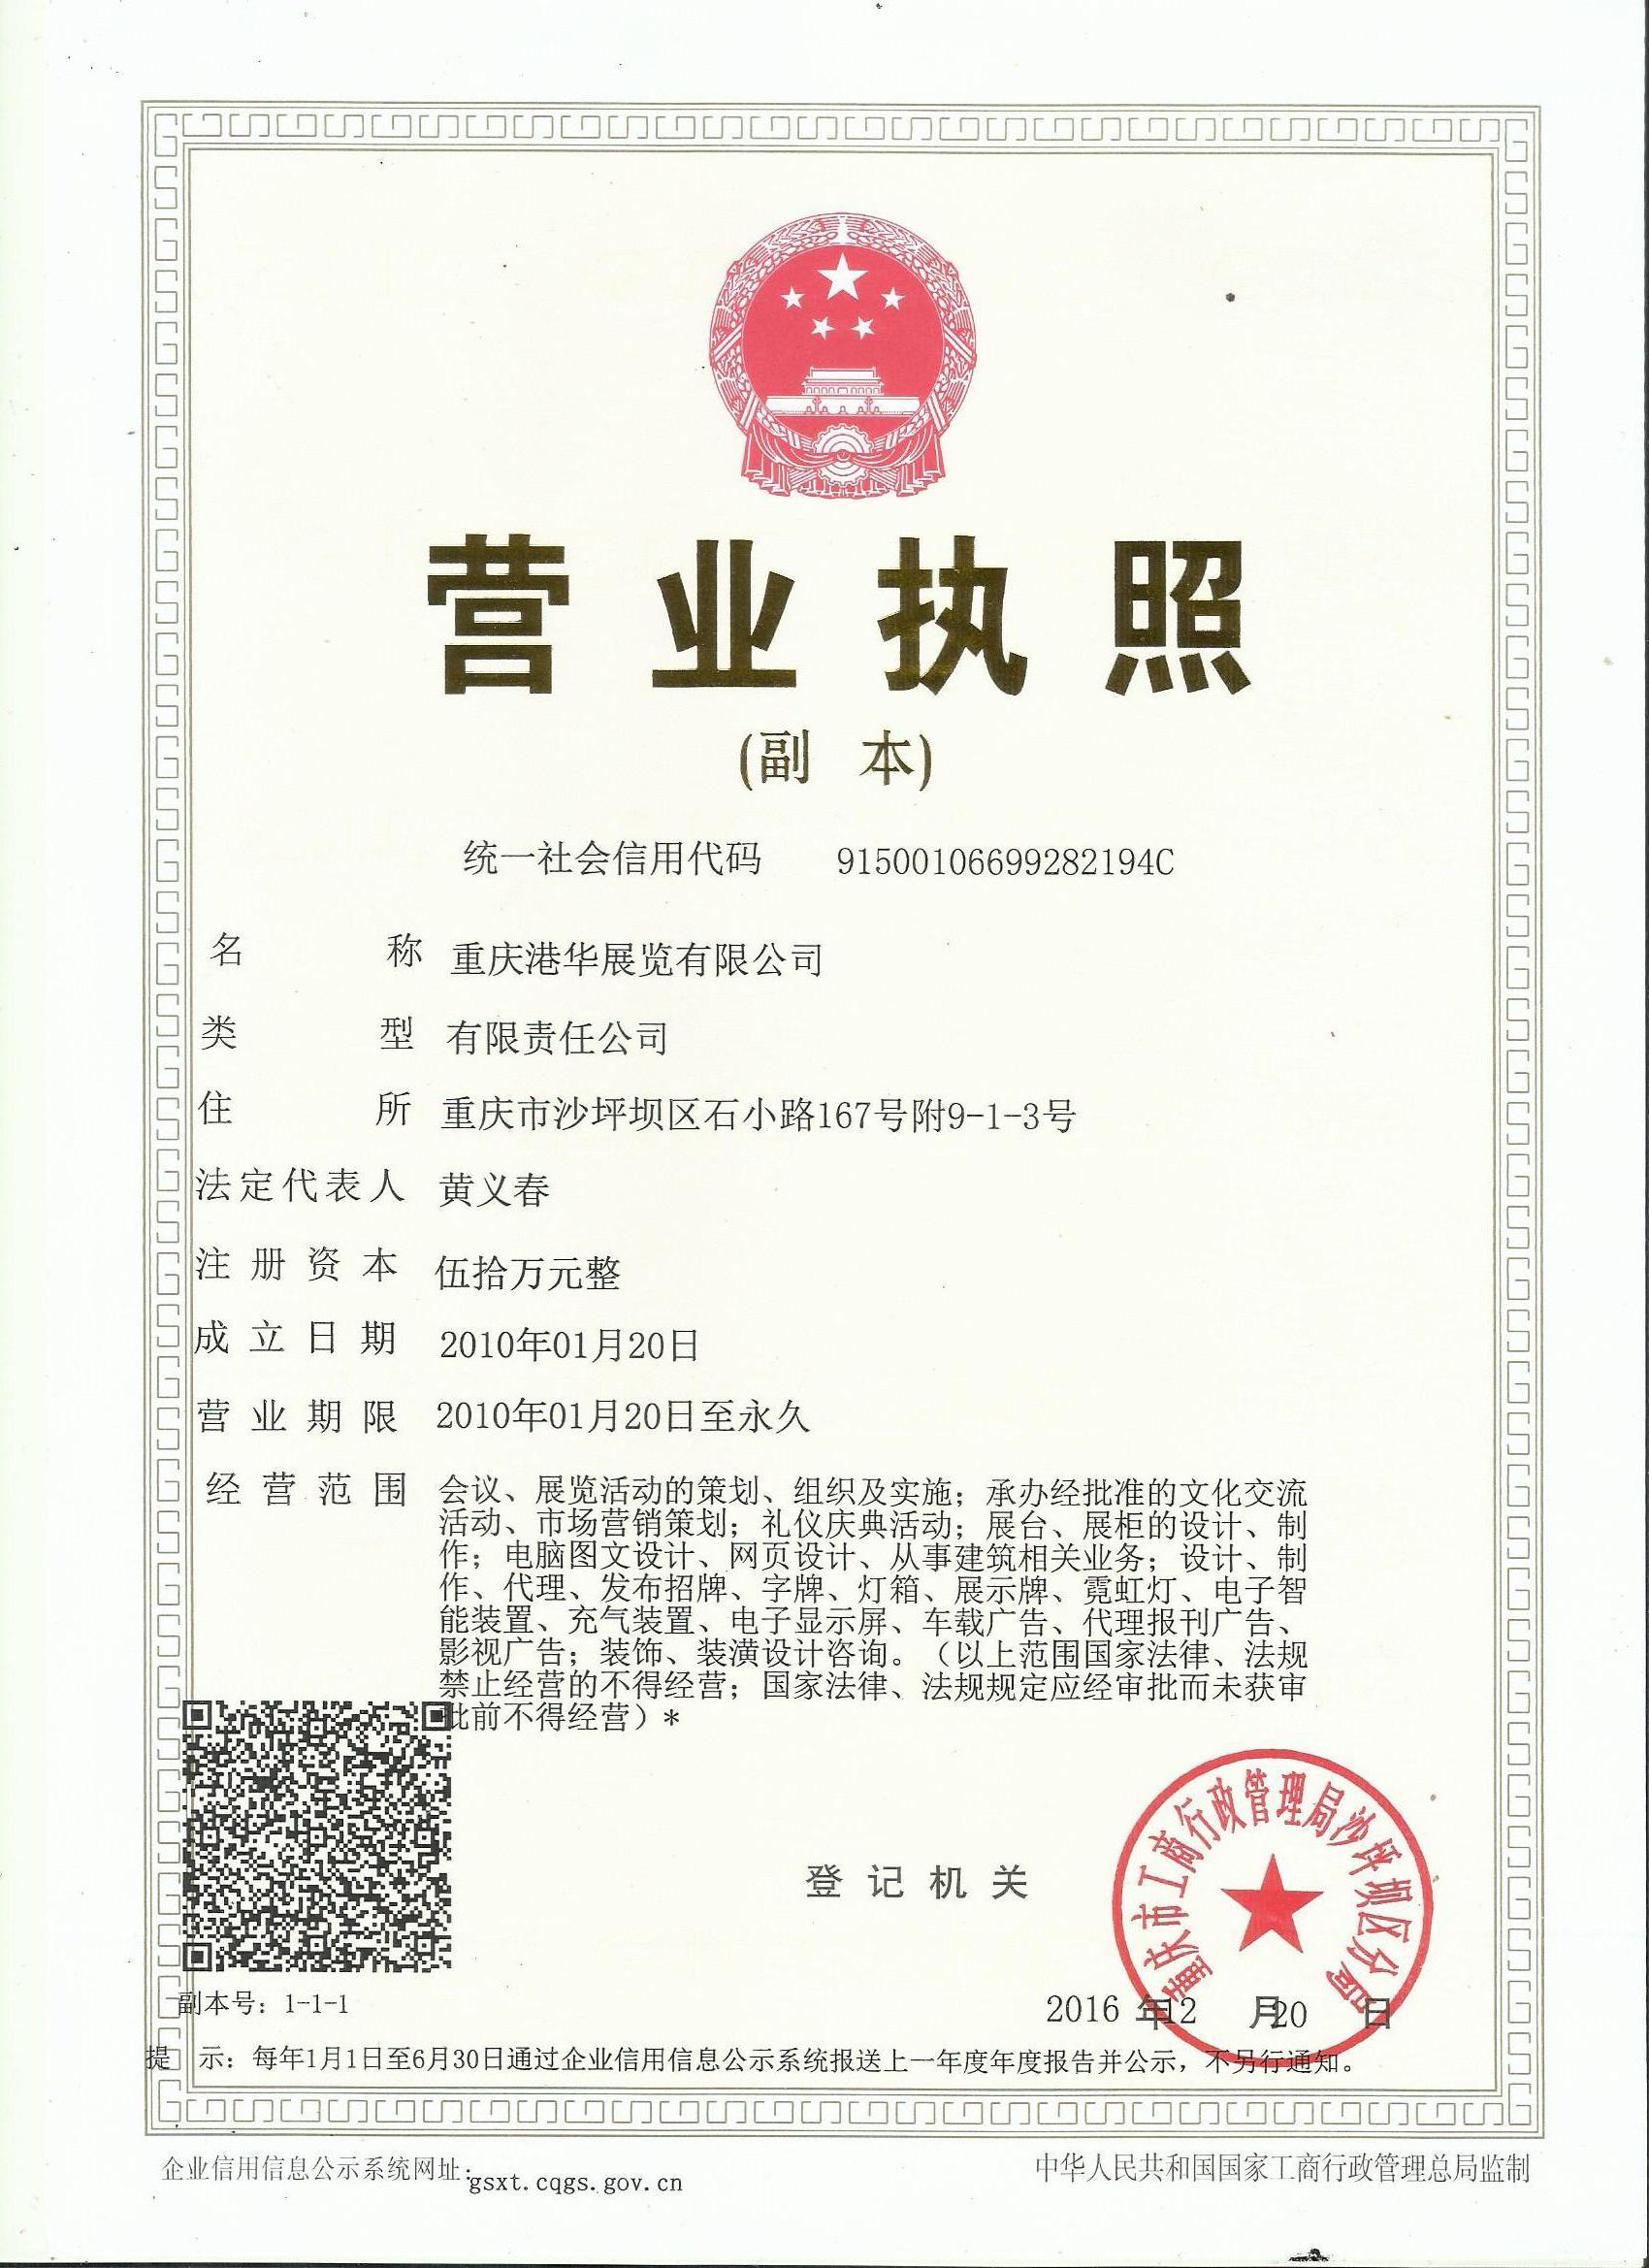 2020CWEE第八屆中國西部教育博覽會—成渝雙城展